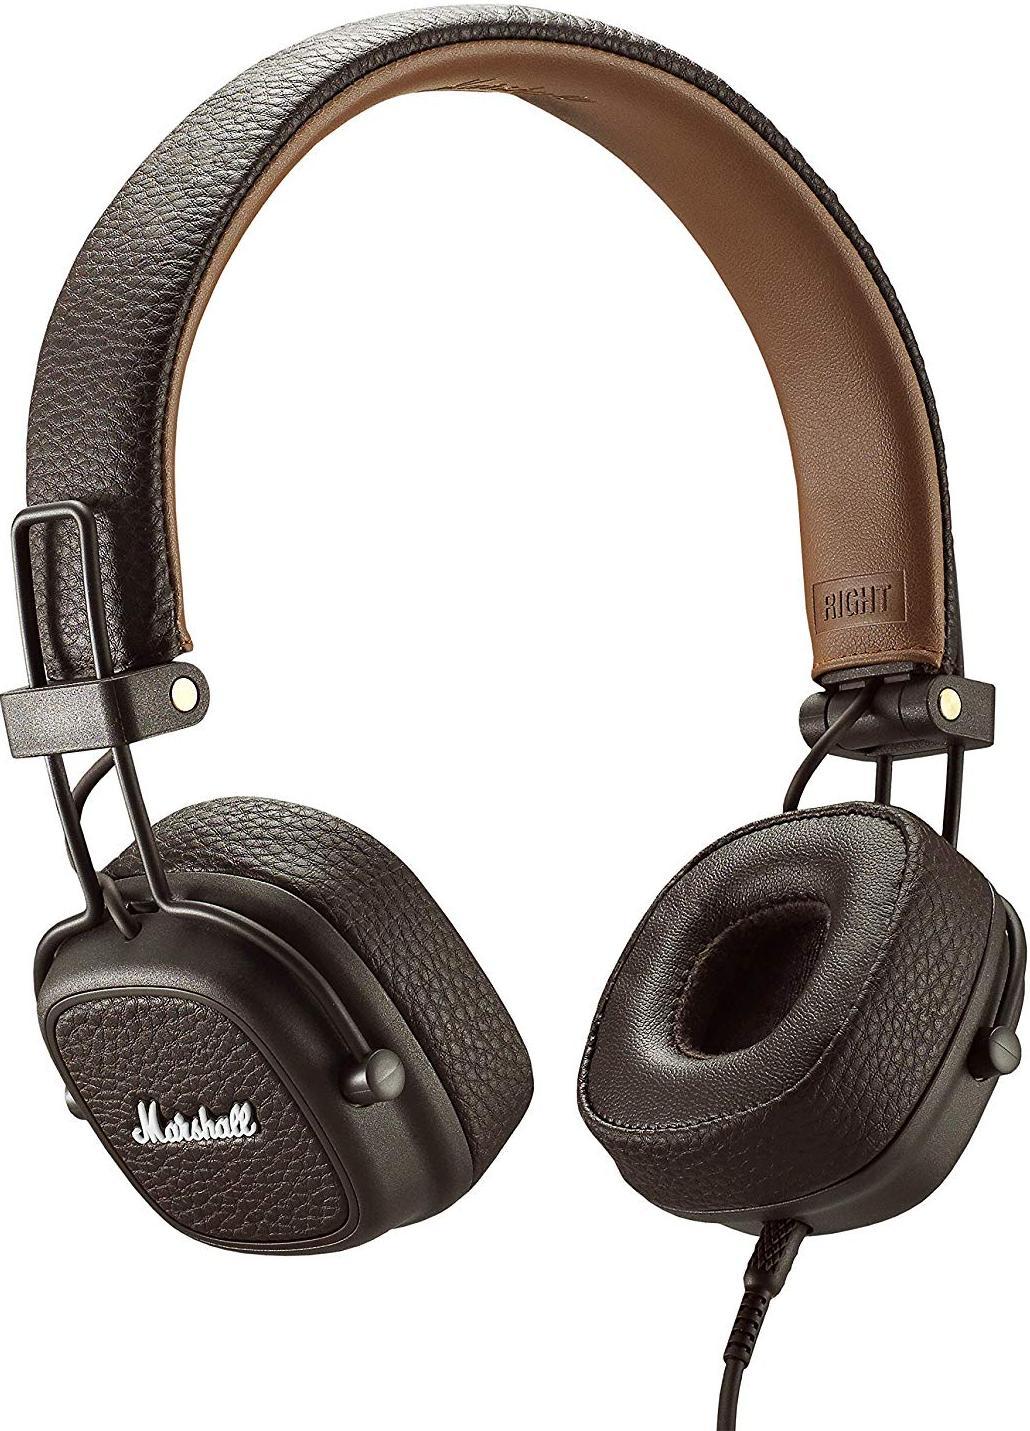 Навушники та гарнітури, Гарнітура Marshall Major III Brown (4092184)  - купить со скидкой